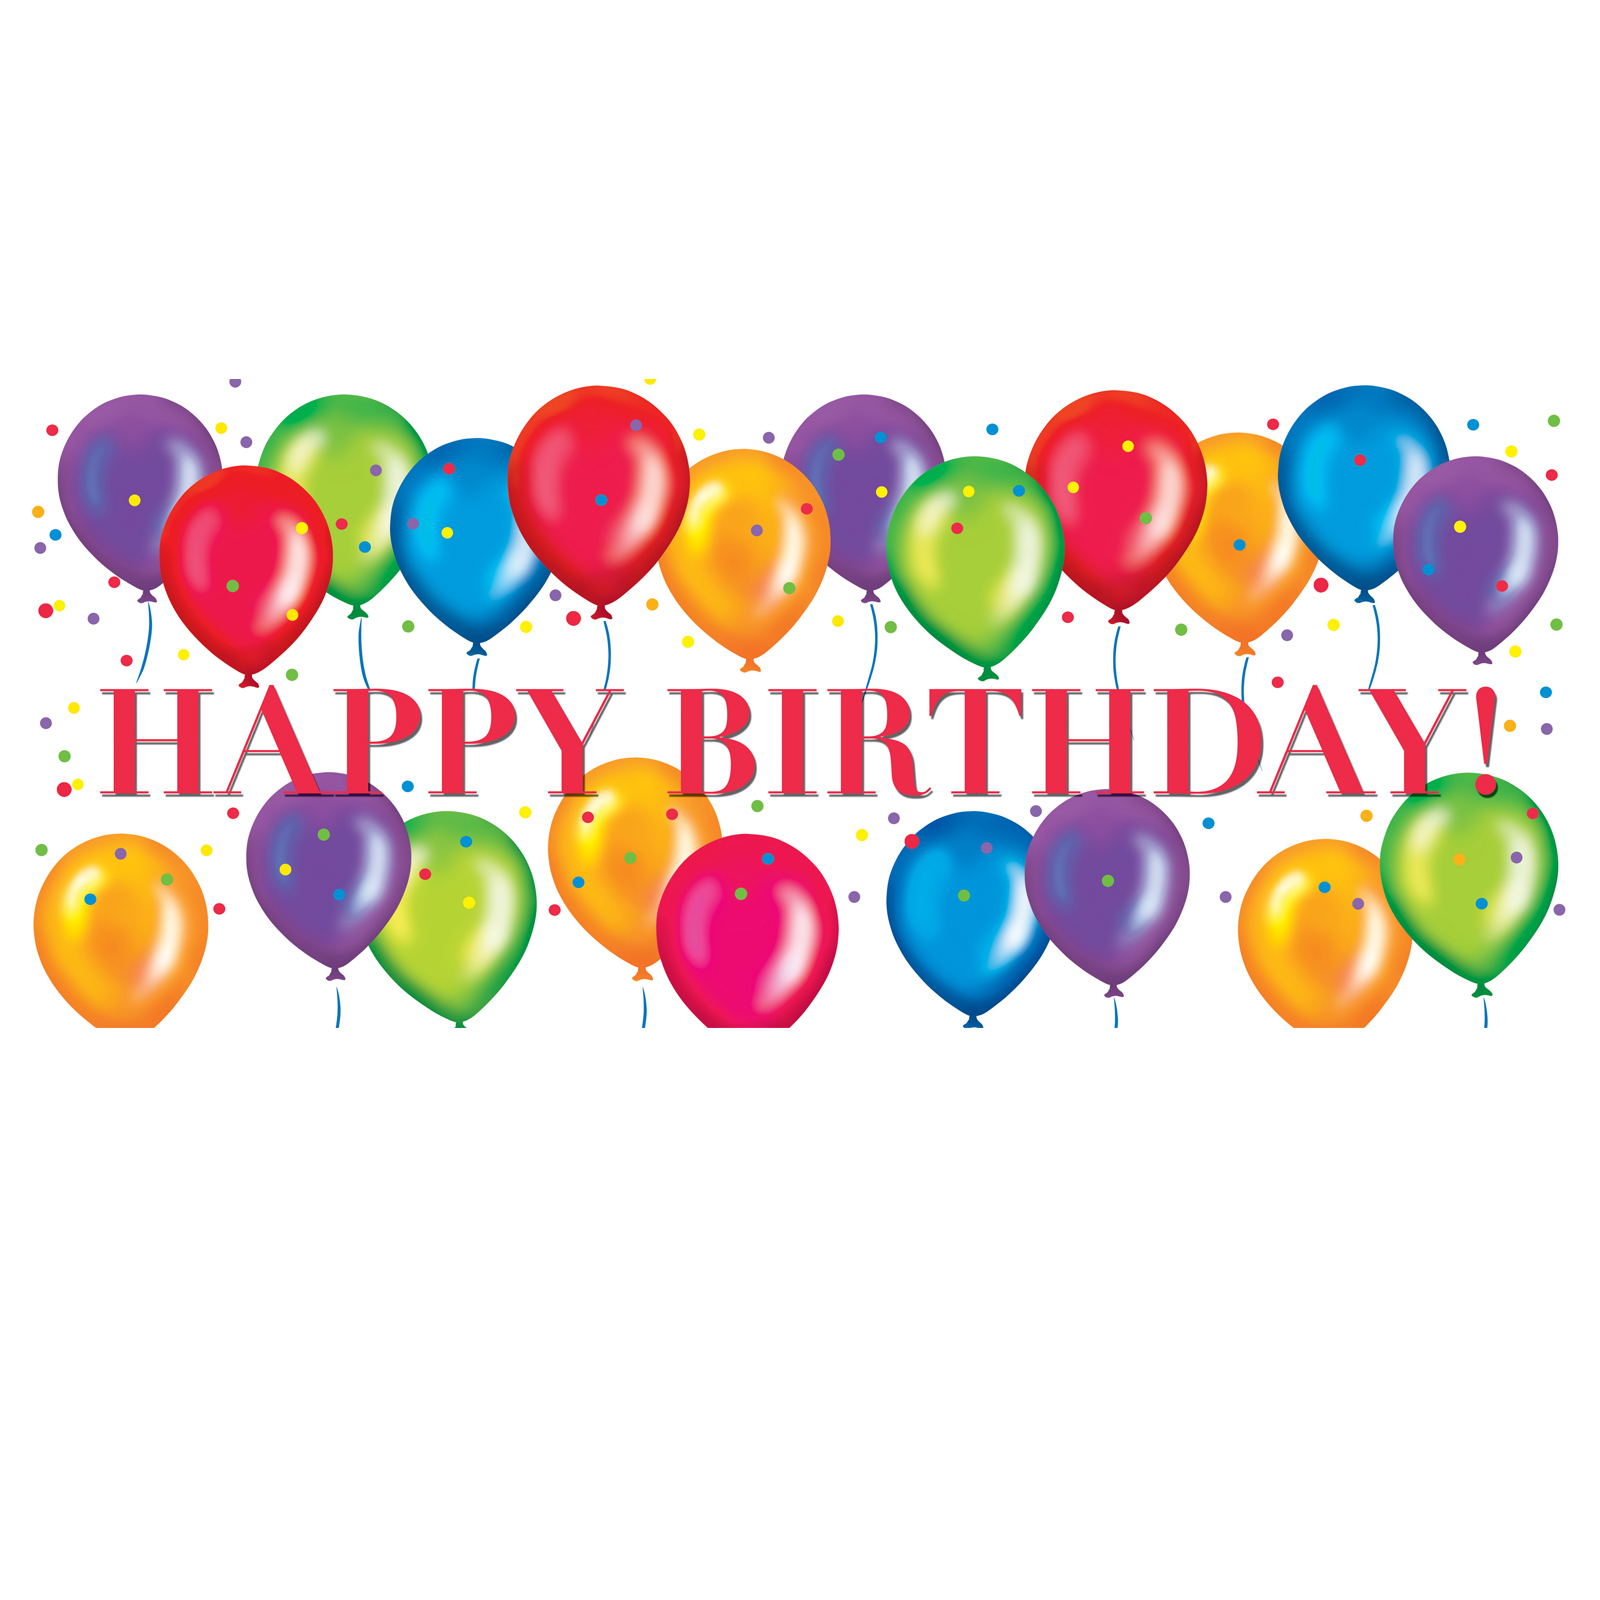 1600x1600 Happy Birthday Clipart Birthday On Happy Clip Art And Picasa 3